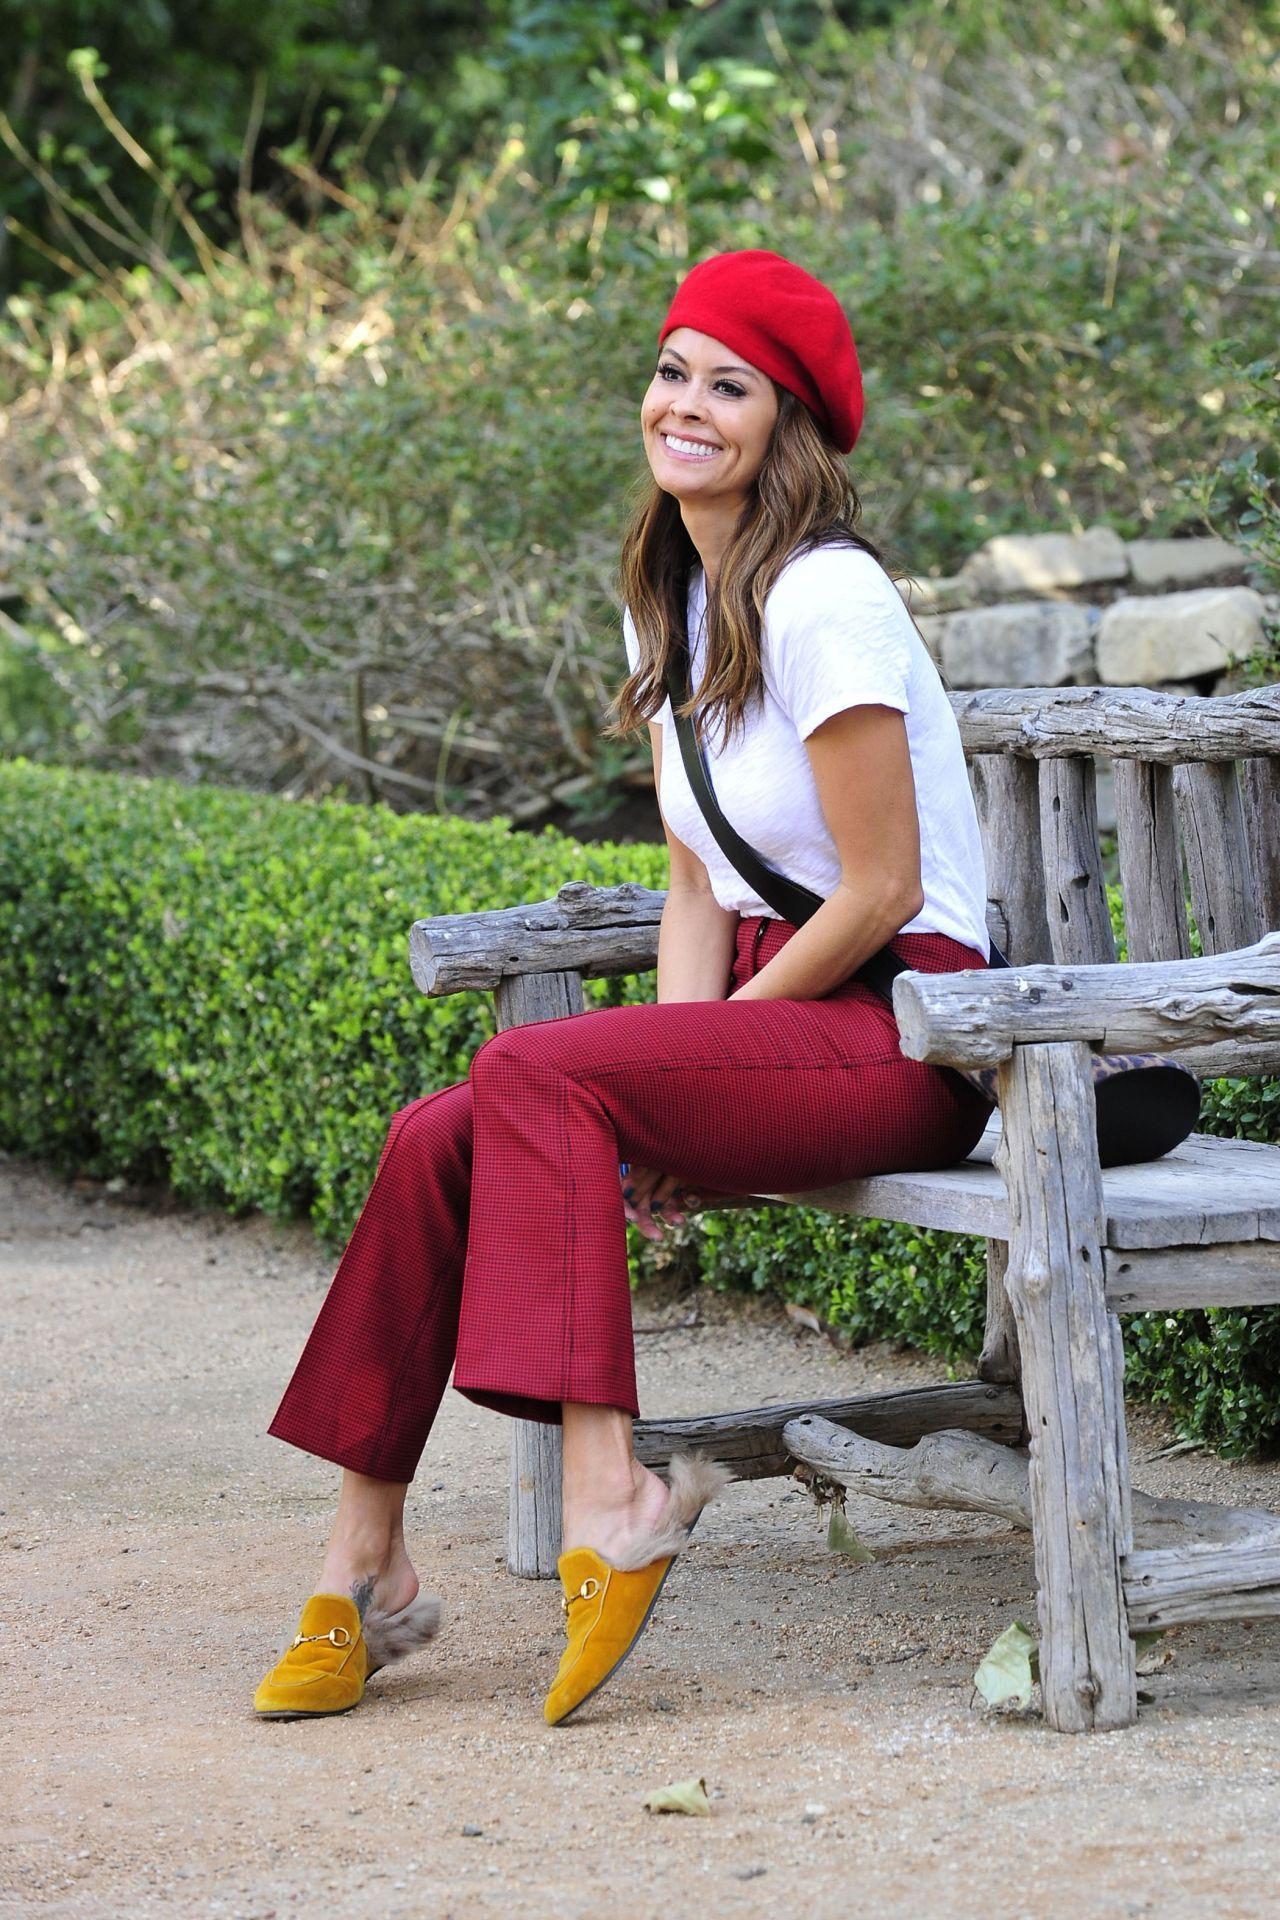 Brooke Burke in Red Bikini and Santa hat in Malibu Pic 1 of 35